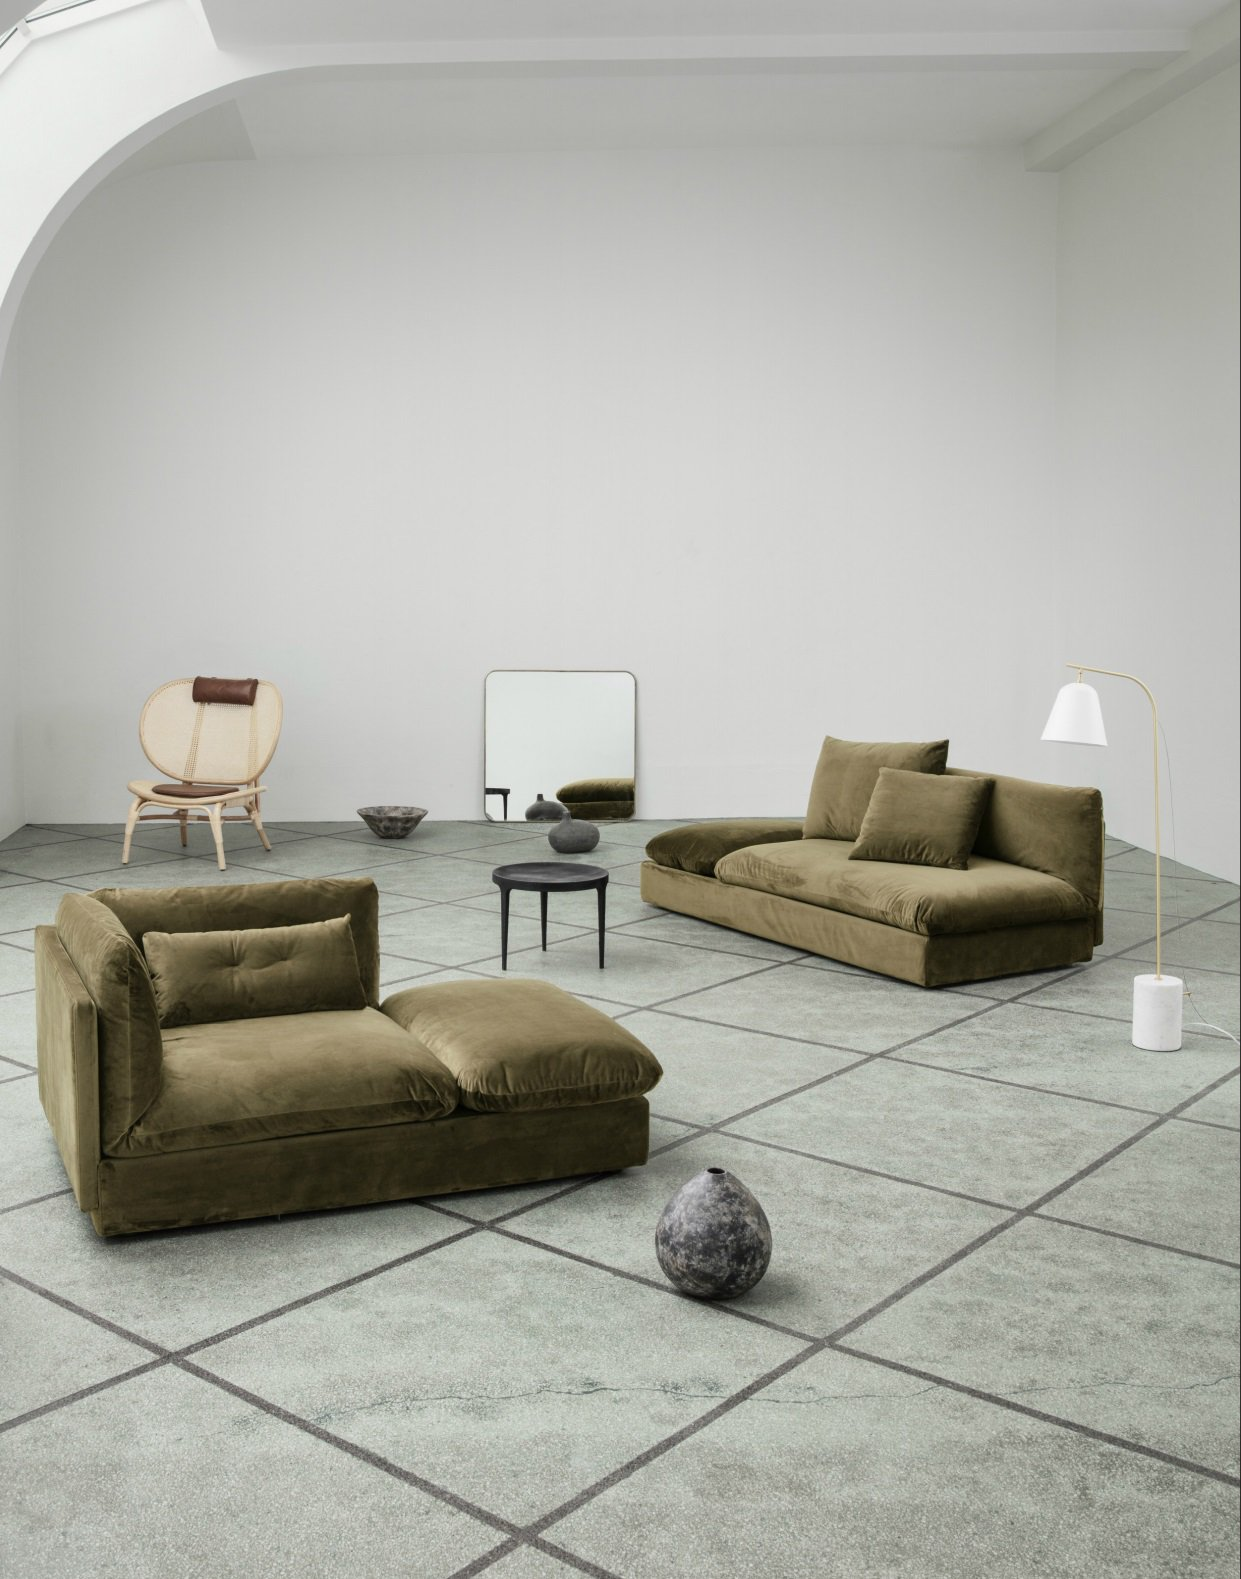 Pand192, Interior designers